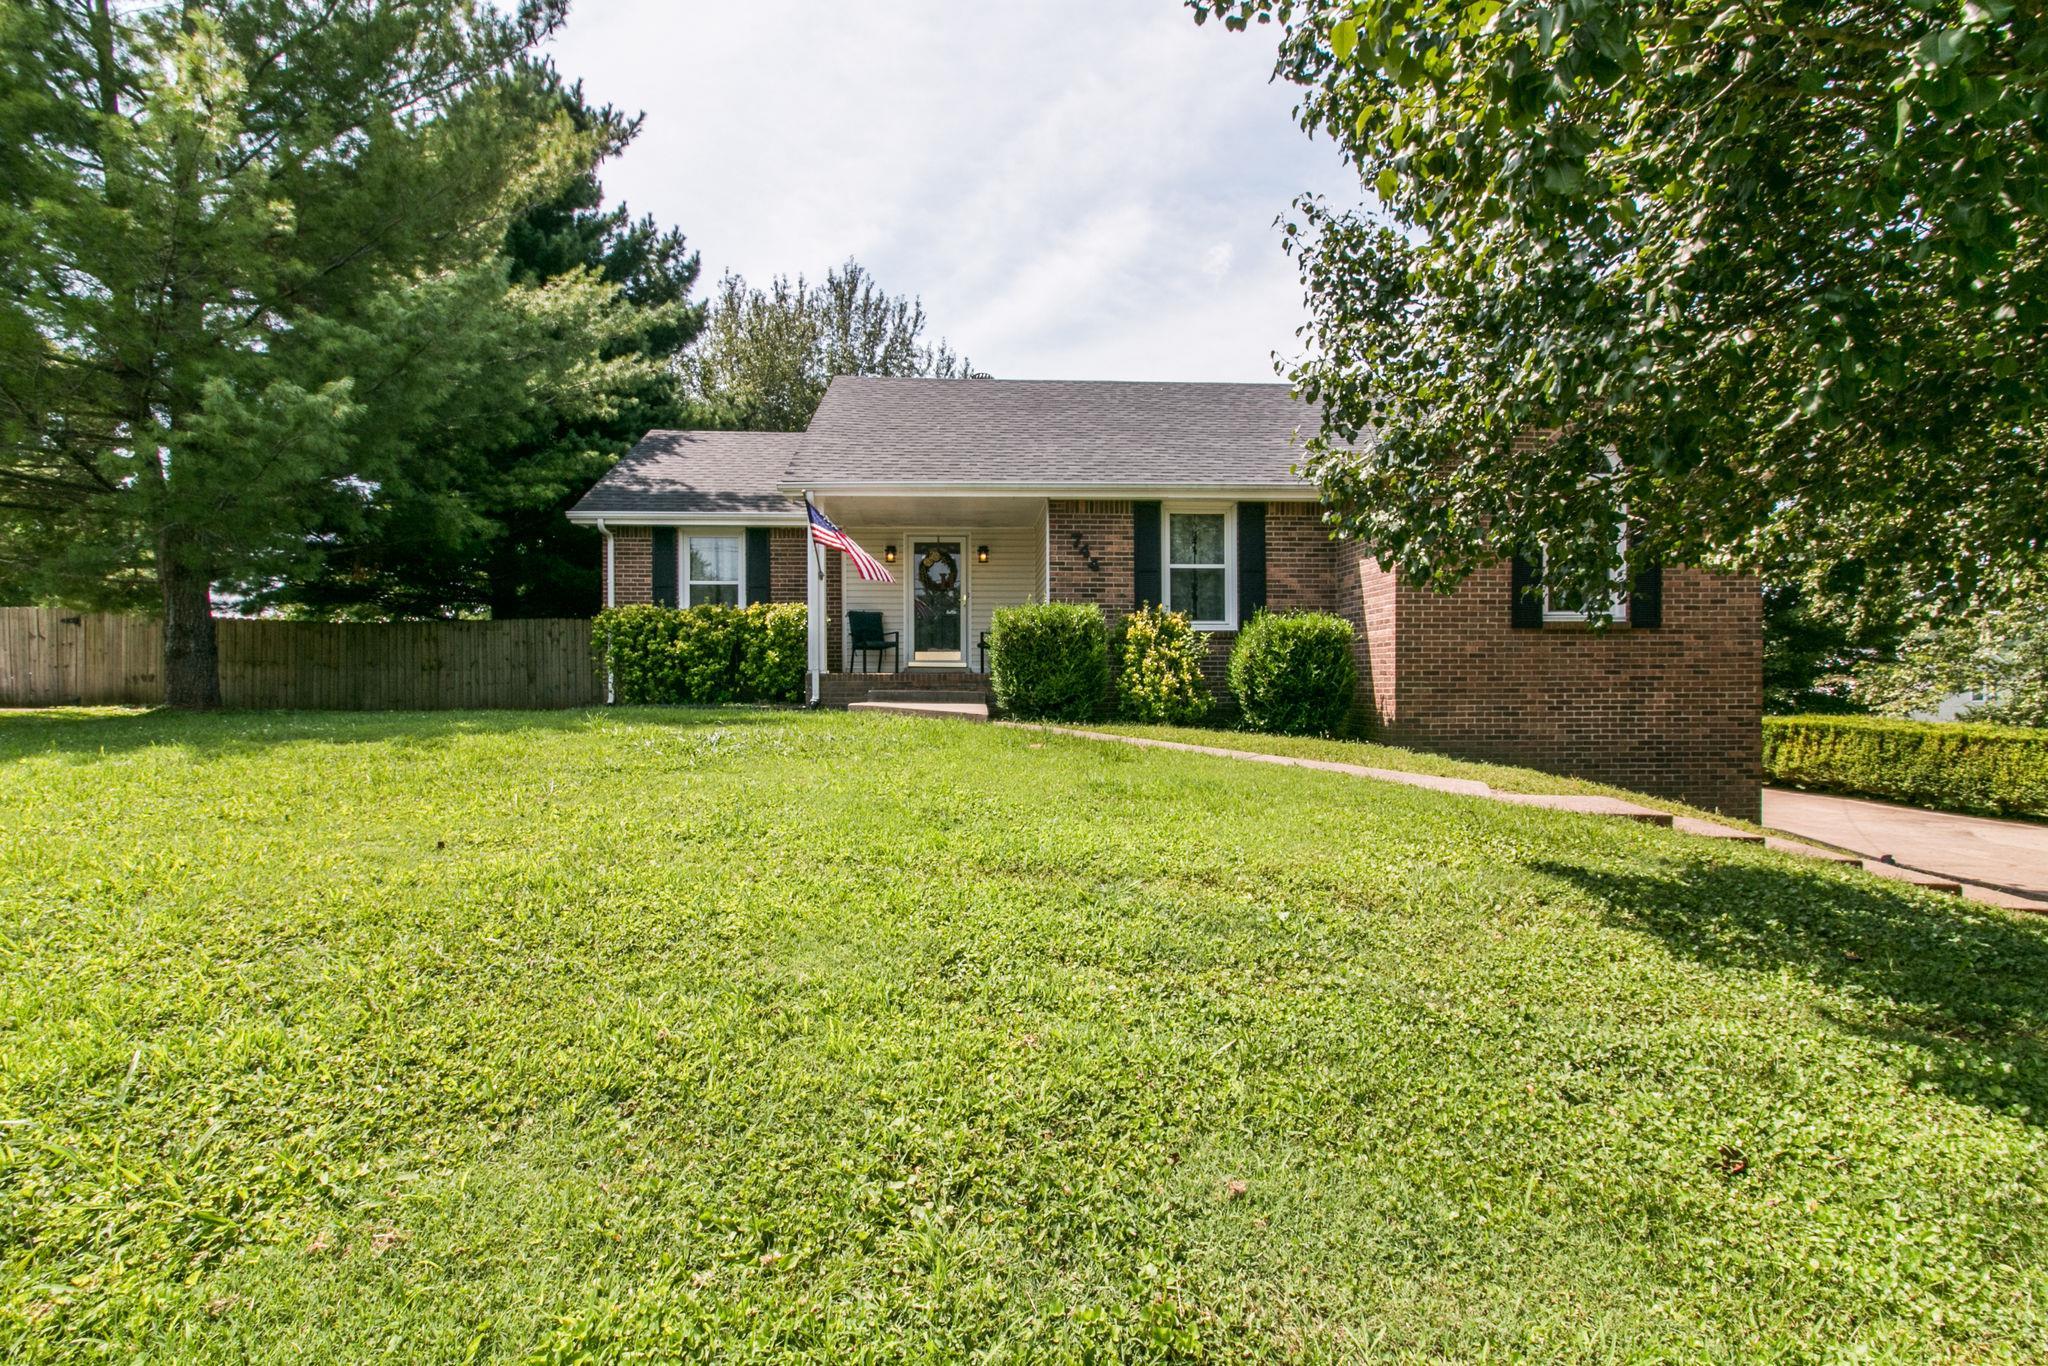 744 Jace Dr, Clarksville, TN 37040 - Clarksville, TN real estate listing